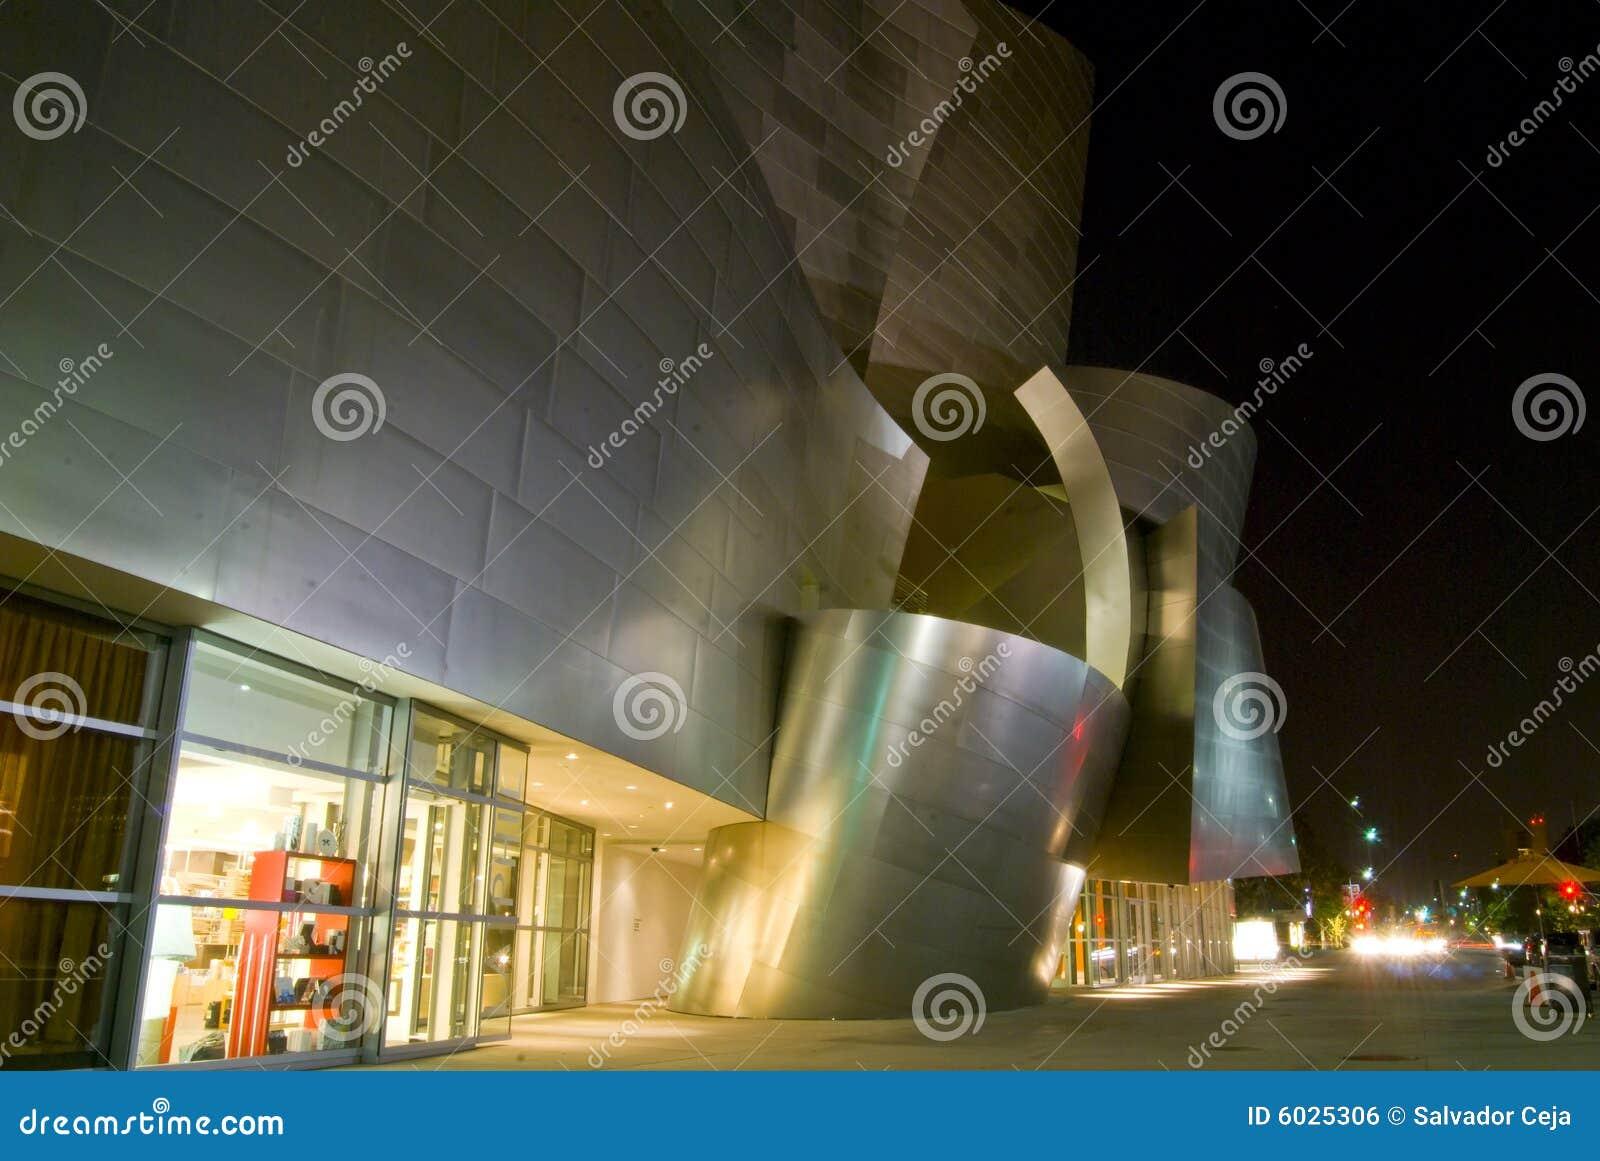 De moderne Architectuur van Los Angeles